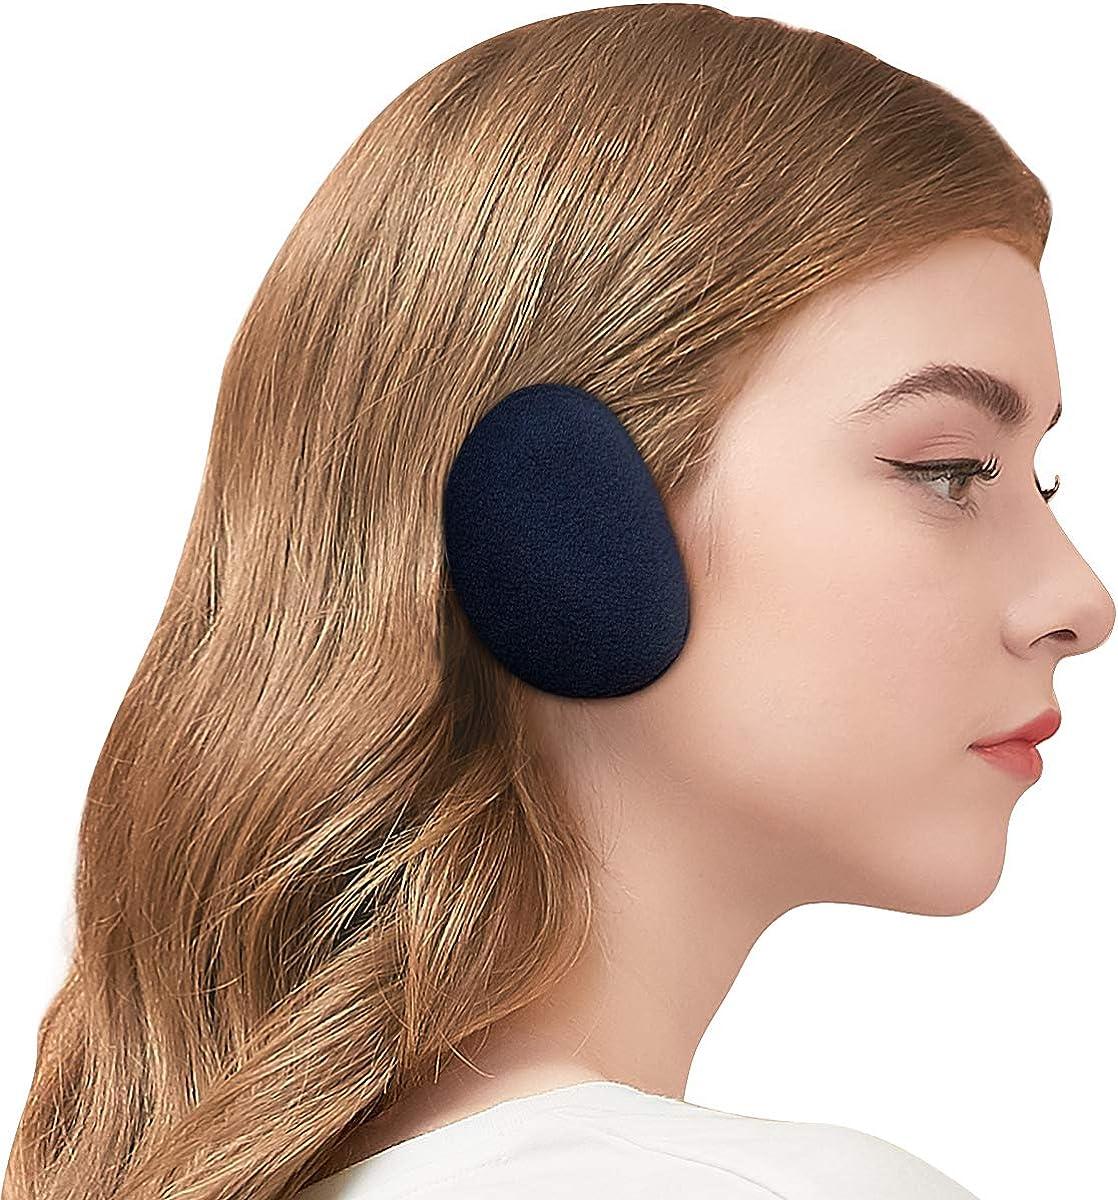 1 Pairs Winter Fleece Ear Muffs Soft Cover Windproof Earmuffs Outdoor for Men Women 3 Sizes Bandless Ear Warmers